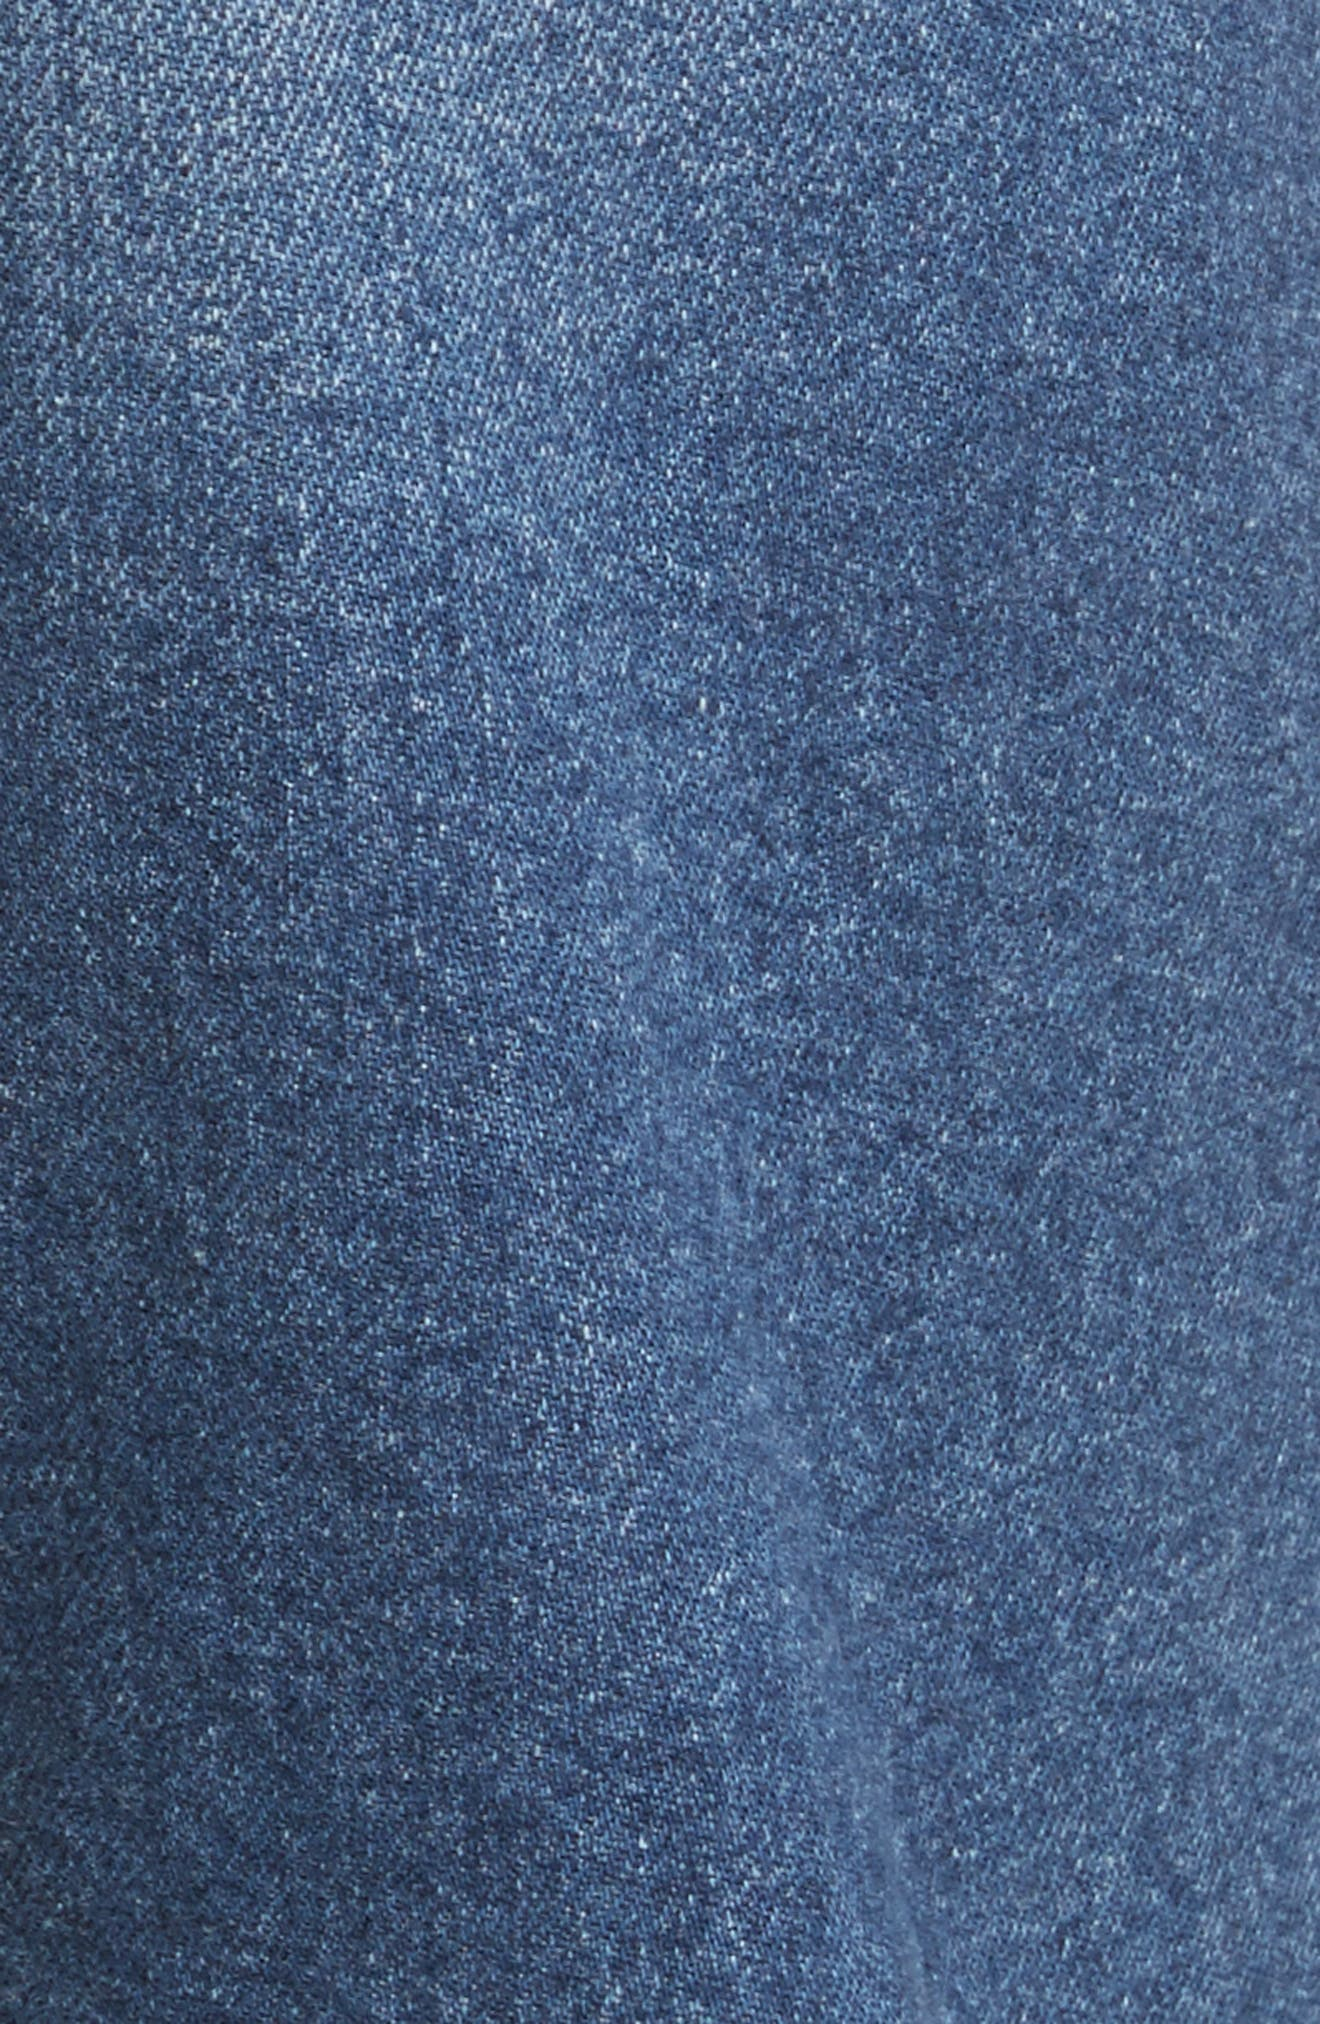 W3 Higher Ground Fringe Crop Straight Leg Jeans,                             Alternate thumbnail 6, color,                             Spanish Fringe